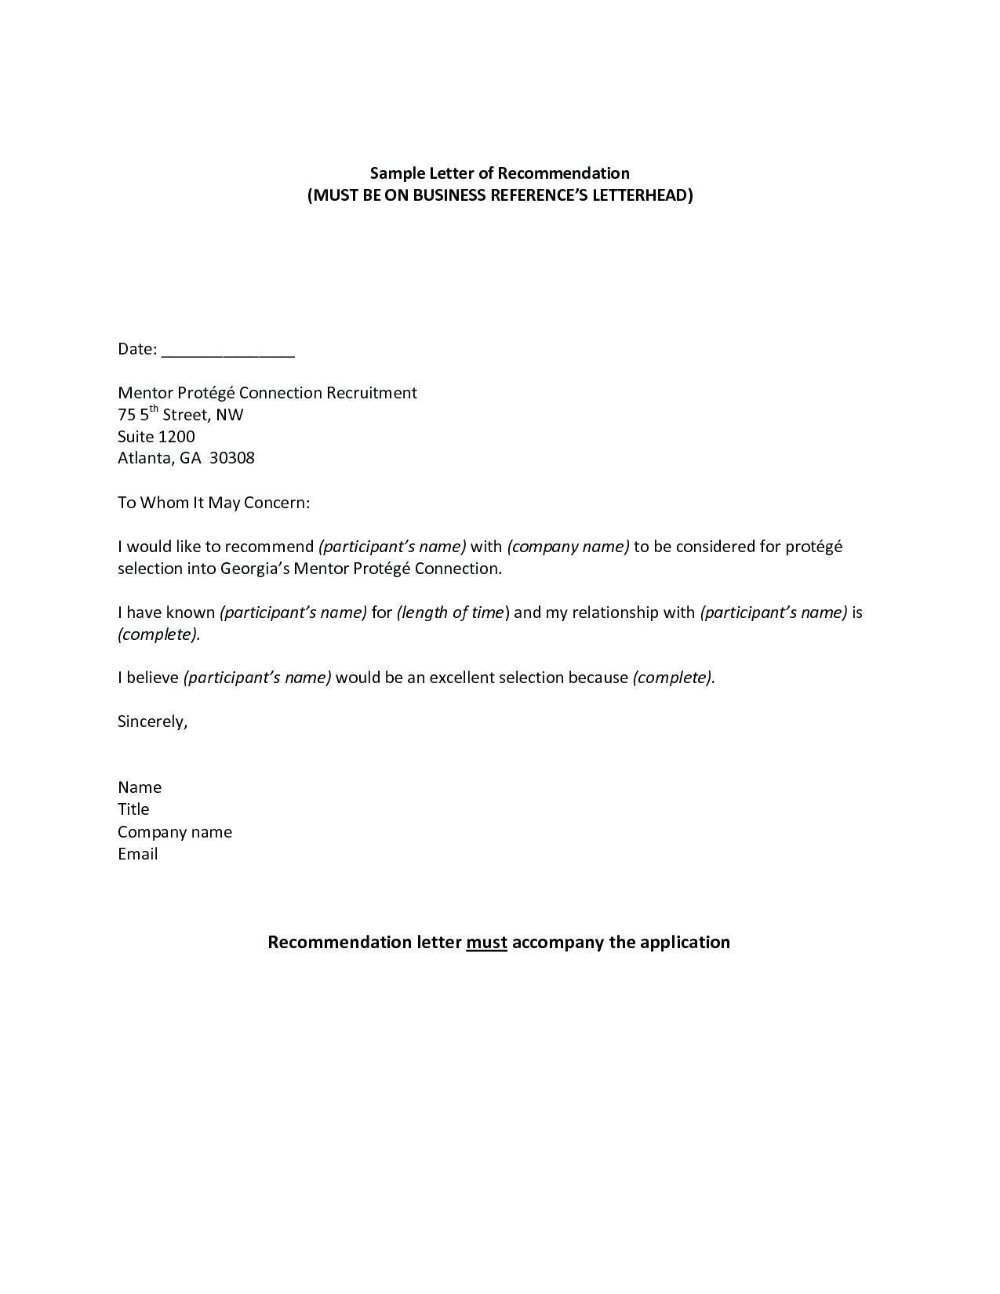 pinwaldwert site on resume formats letterhead sample job